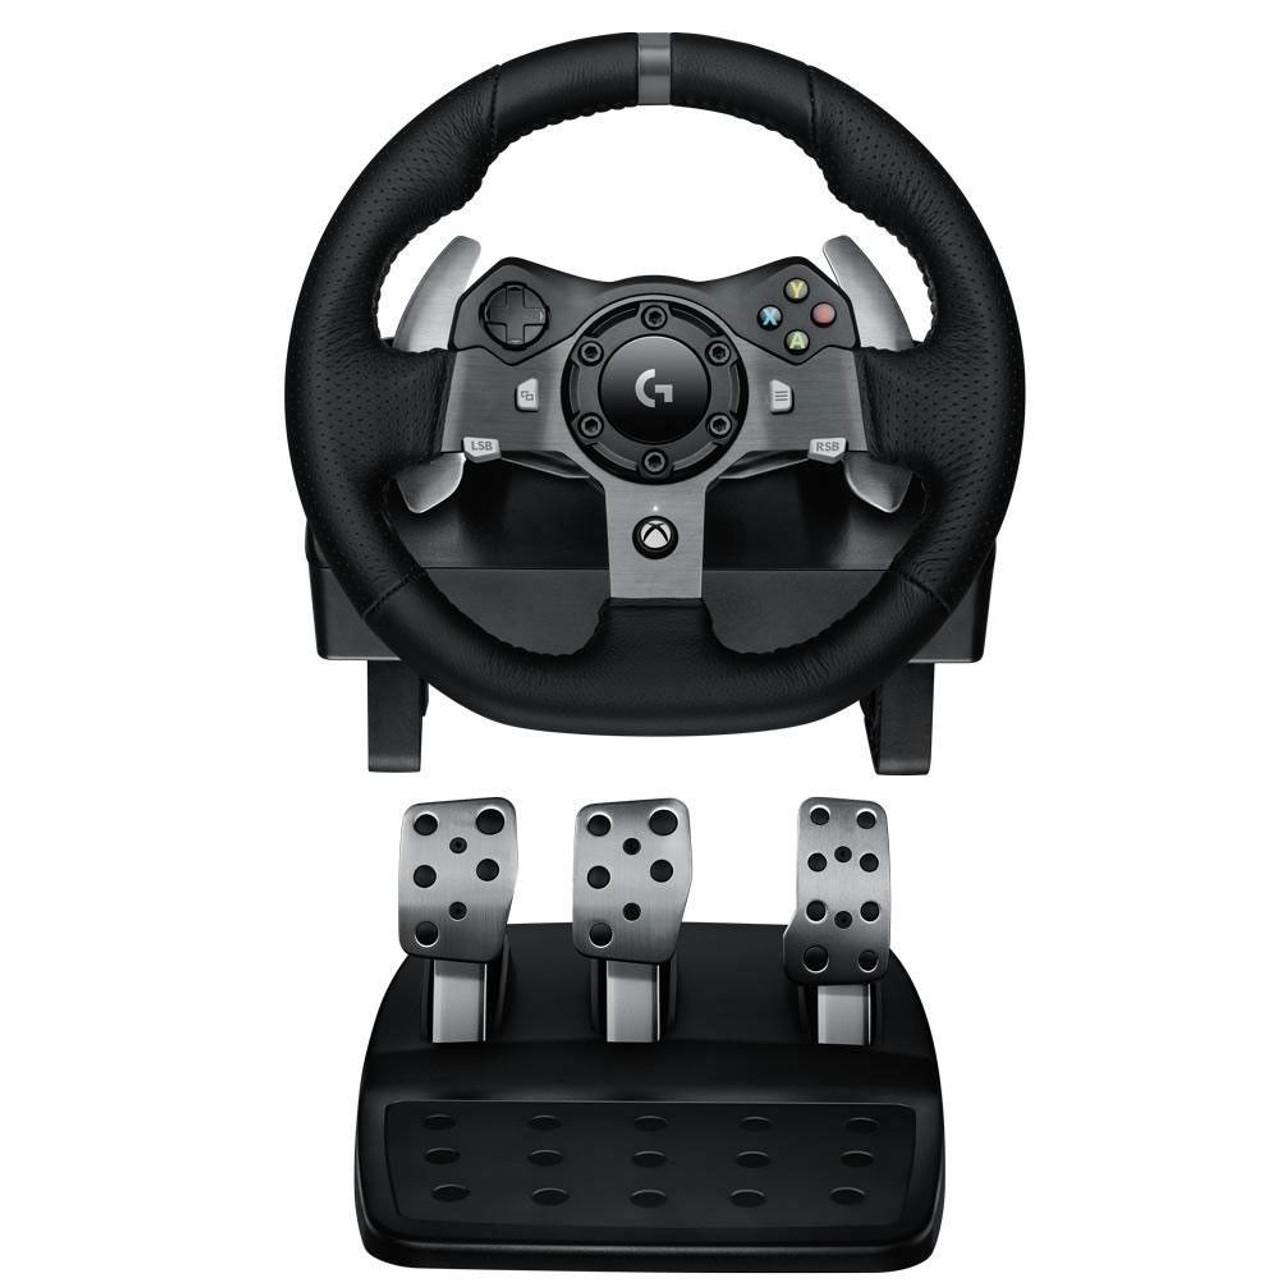 b5be7743715 Logitech G920 Racing Wheel Xbox One and PC| Logitechshop